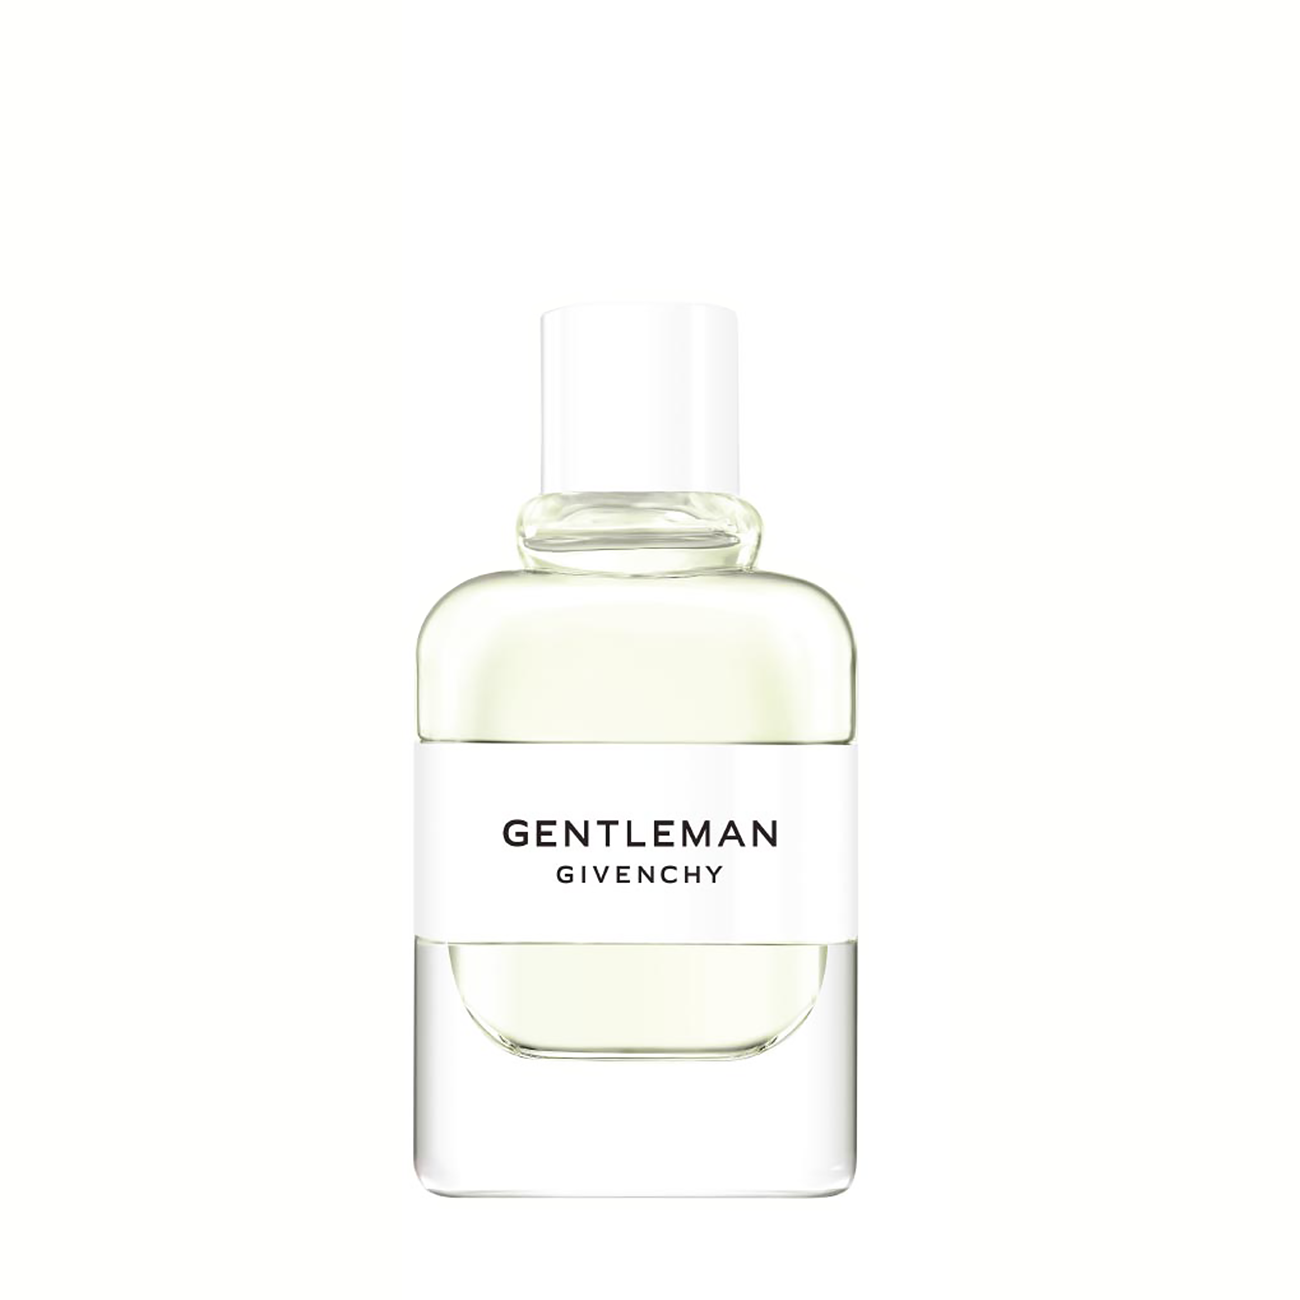 Gentleman Cologne 50ml Givenchy imagine 2021 bestvalue.eu